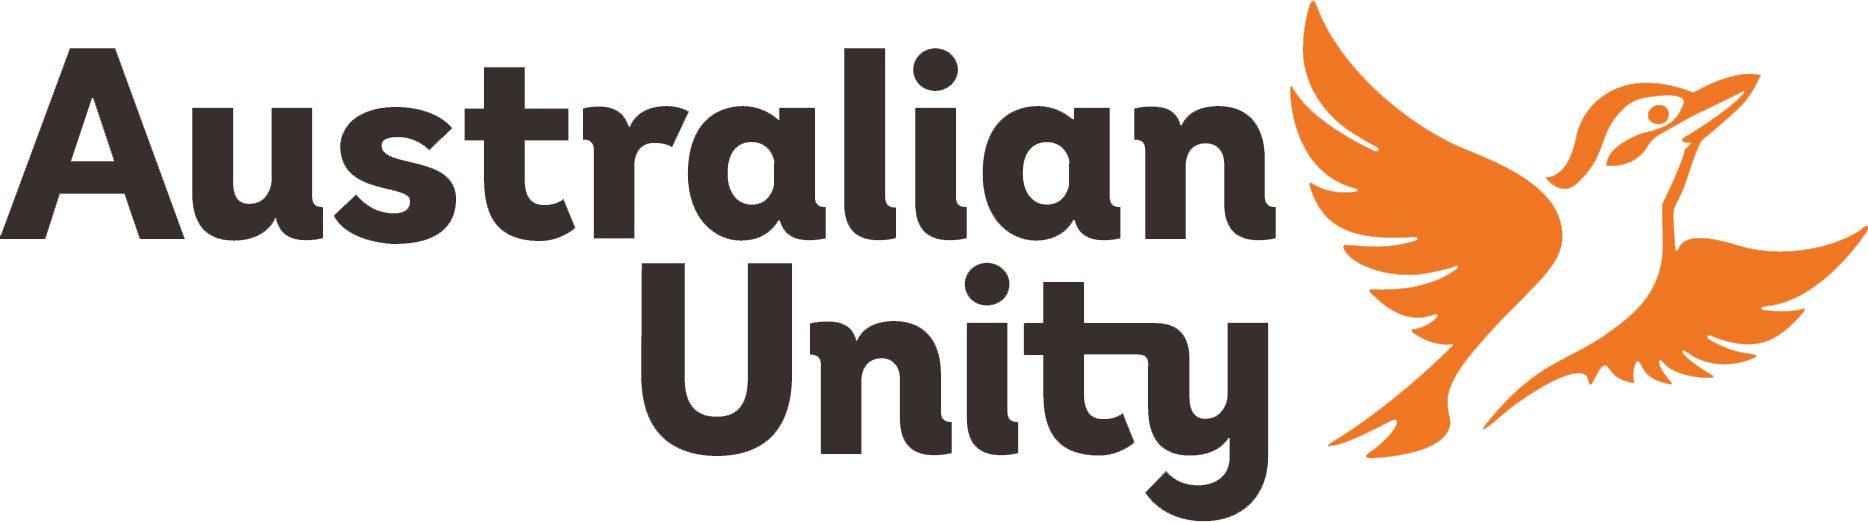 australian unitiy